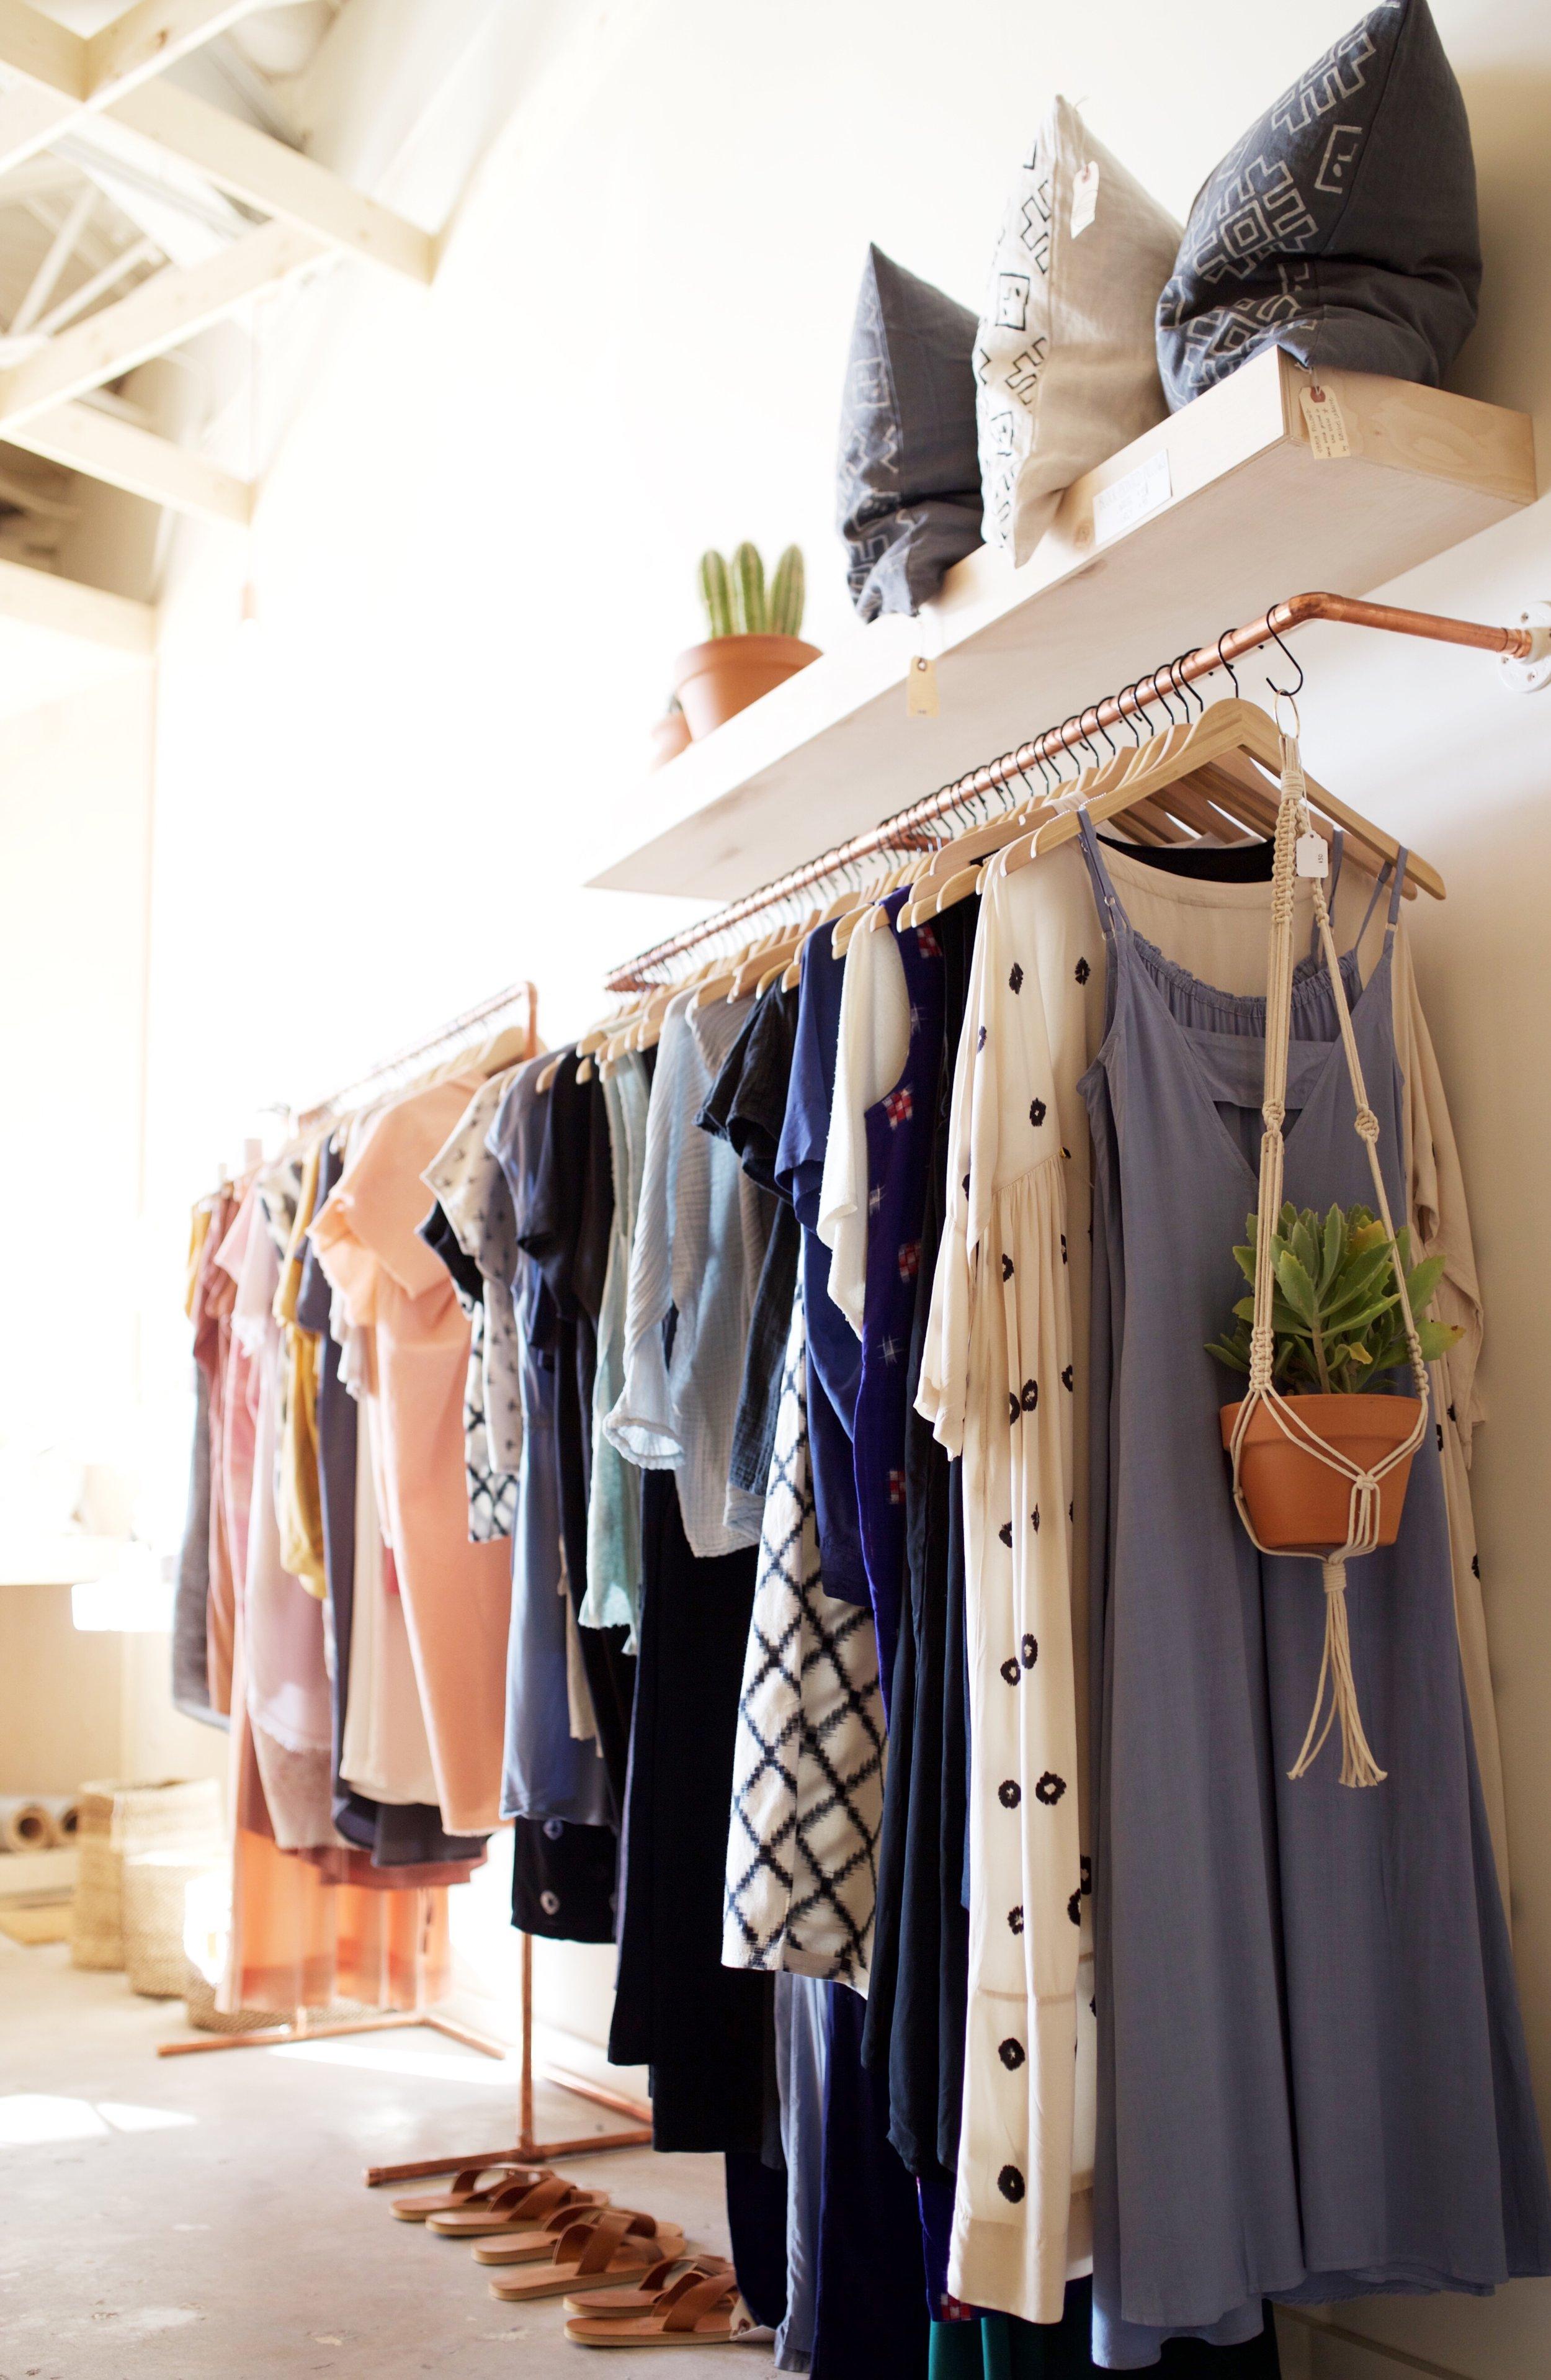 small clothing boutique interior design ideas